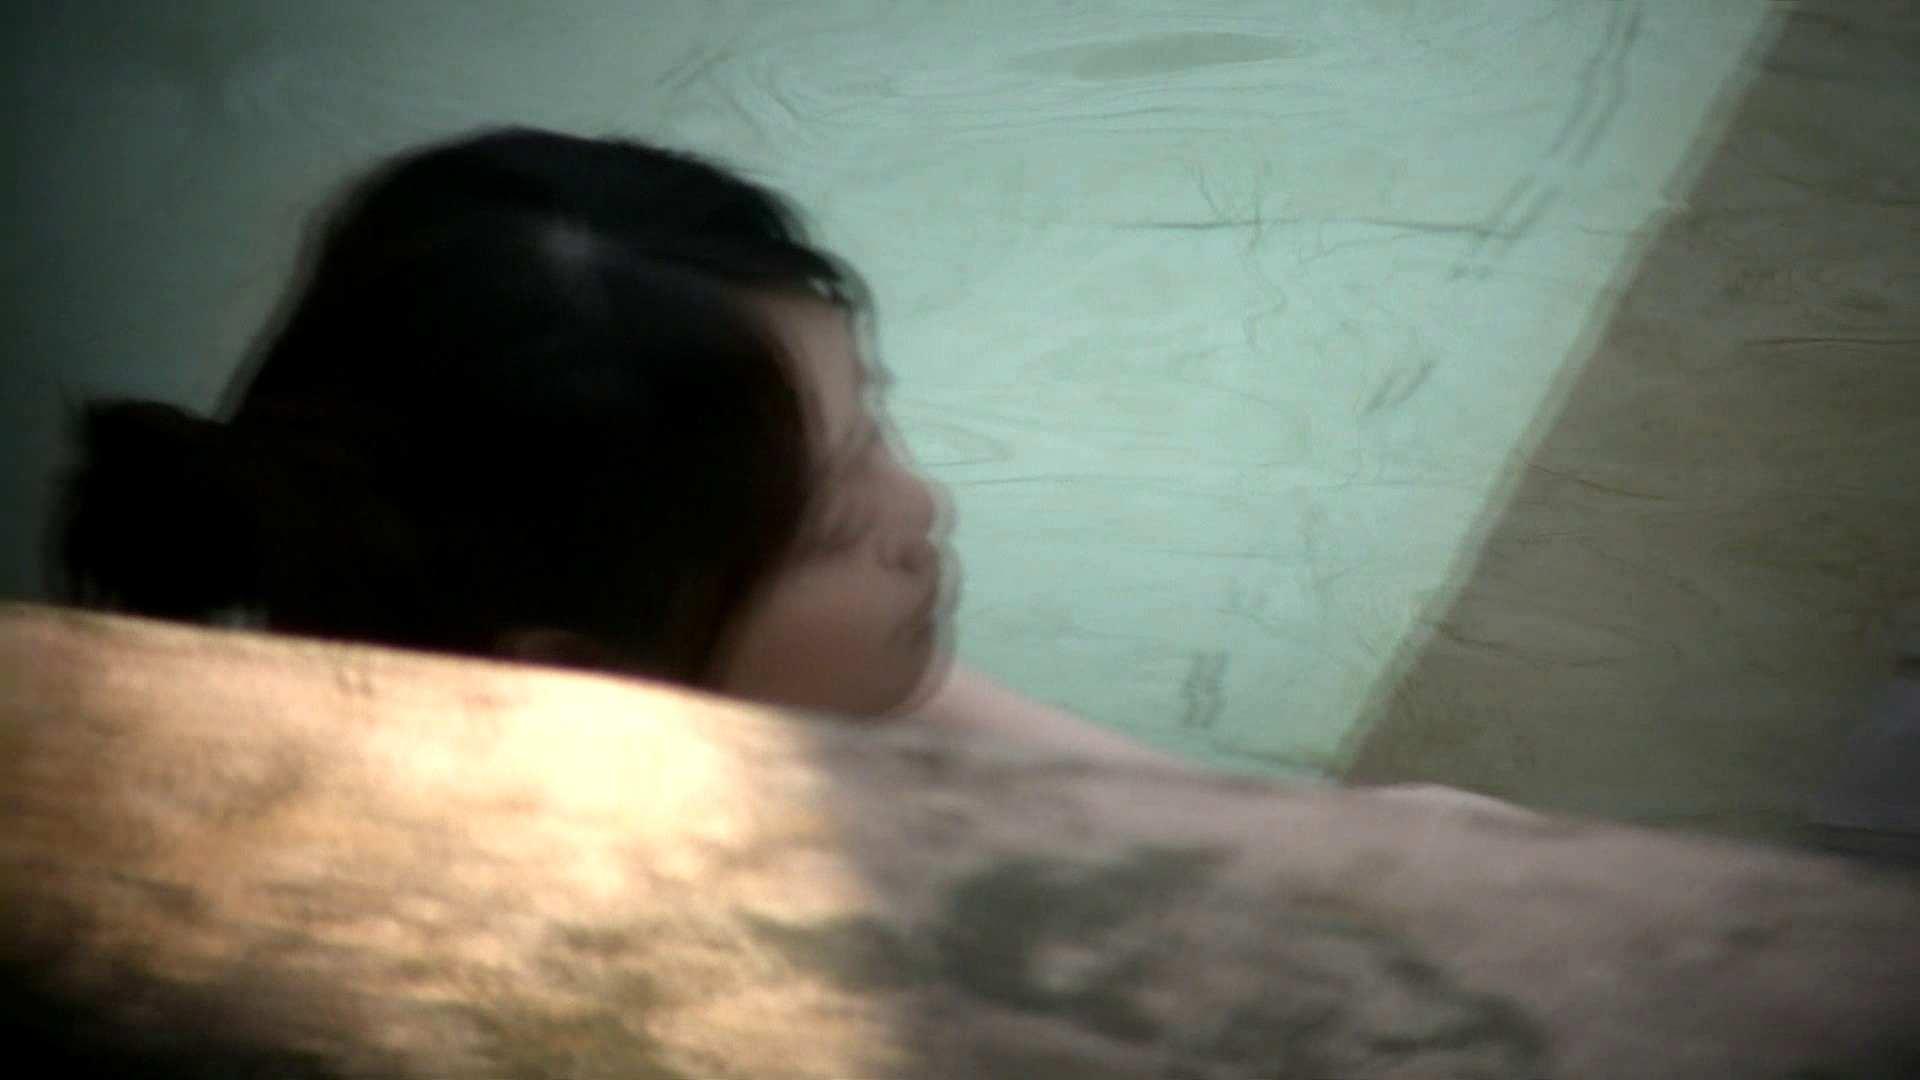 Aquaな露天風呂Vol.652 盗撮 | HなOL  105pic 22